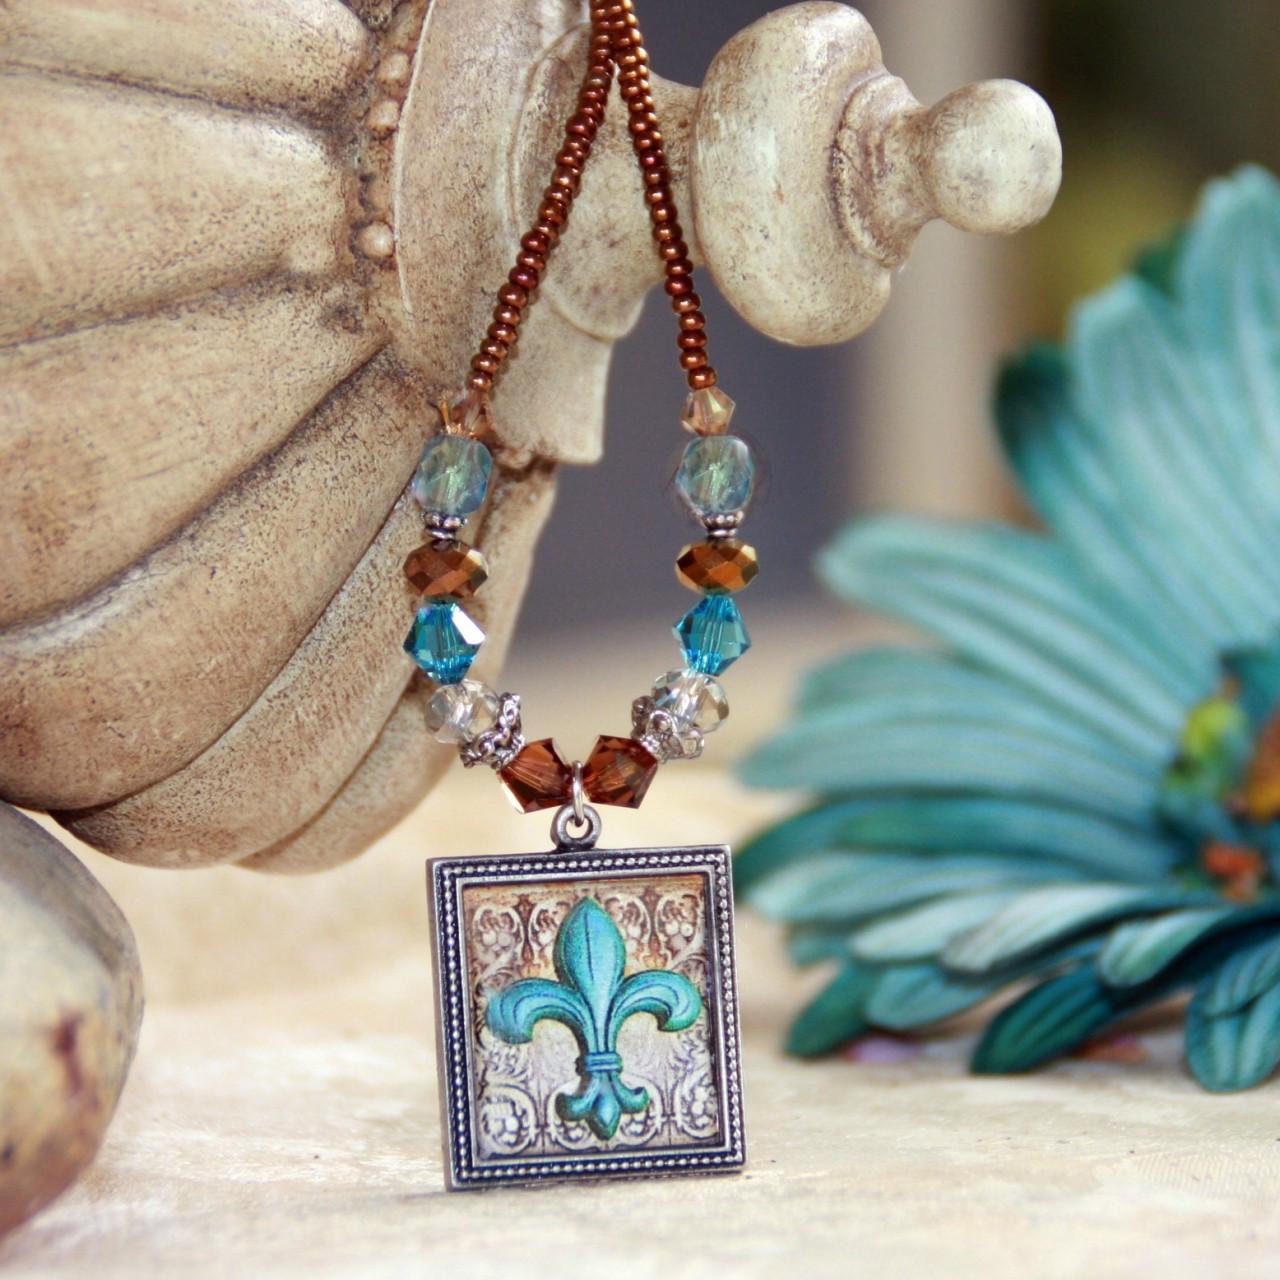 ART-208 Beautfiul Teal Fleur de Lis ART Collection Necklace